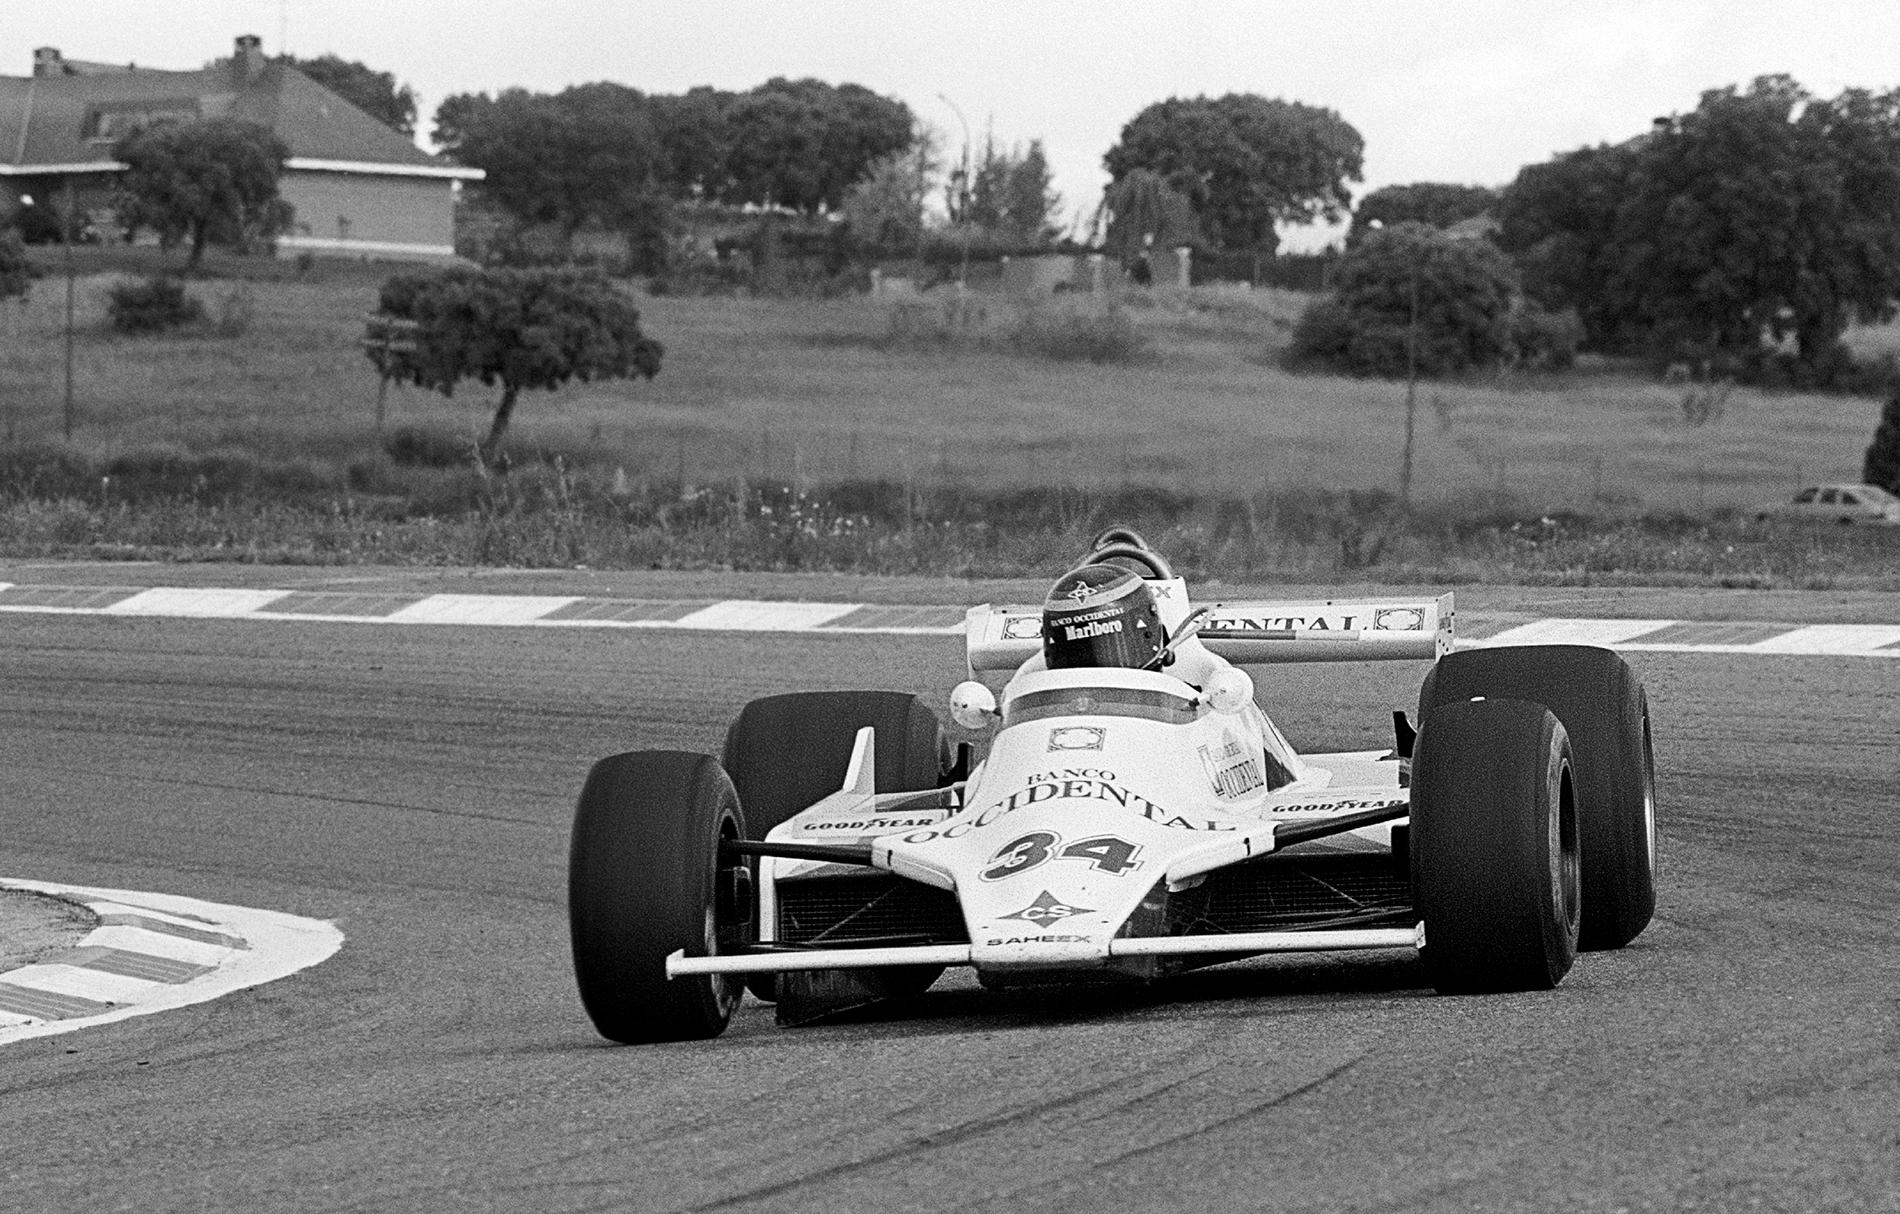 Circuito del Jarama - 1980 - De Villota